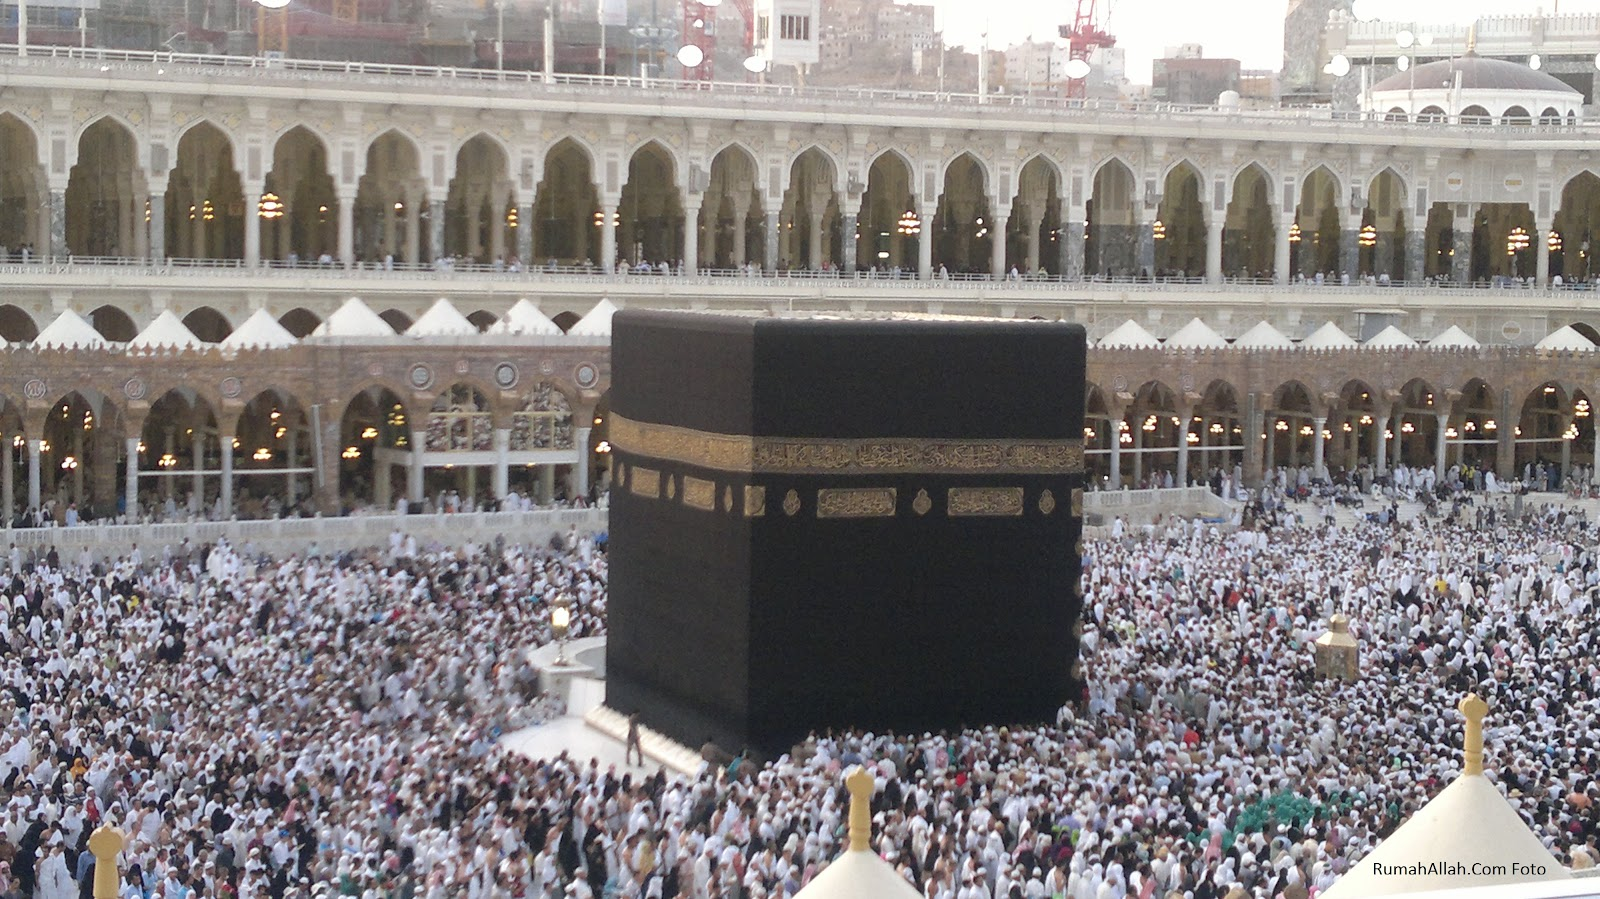 Ikhlas akan Menjaga Kemabruran Haji Seseorang